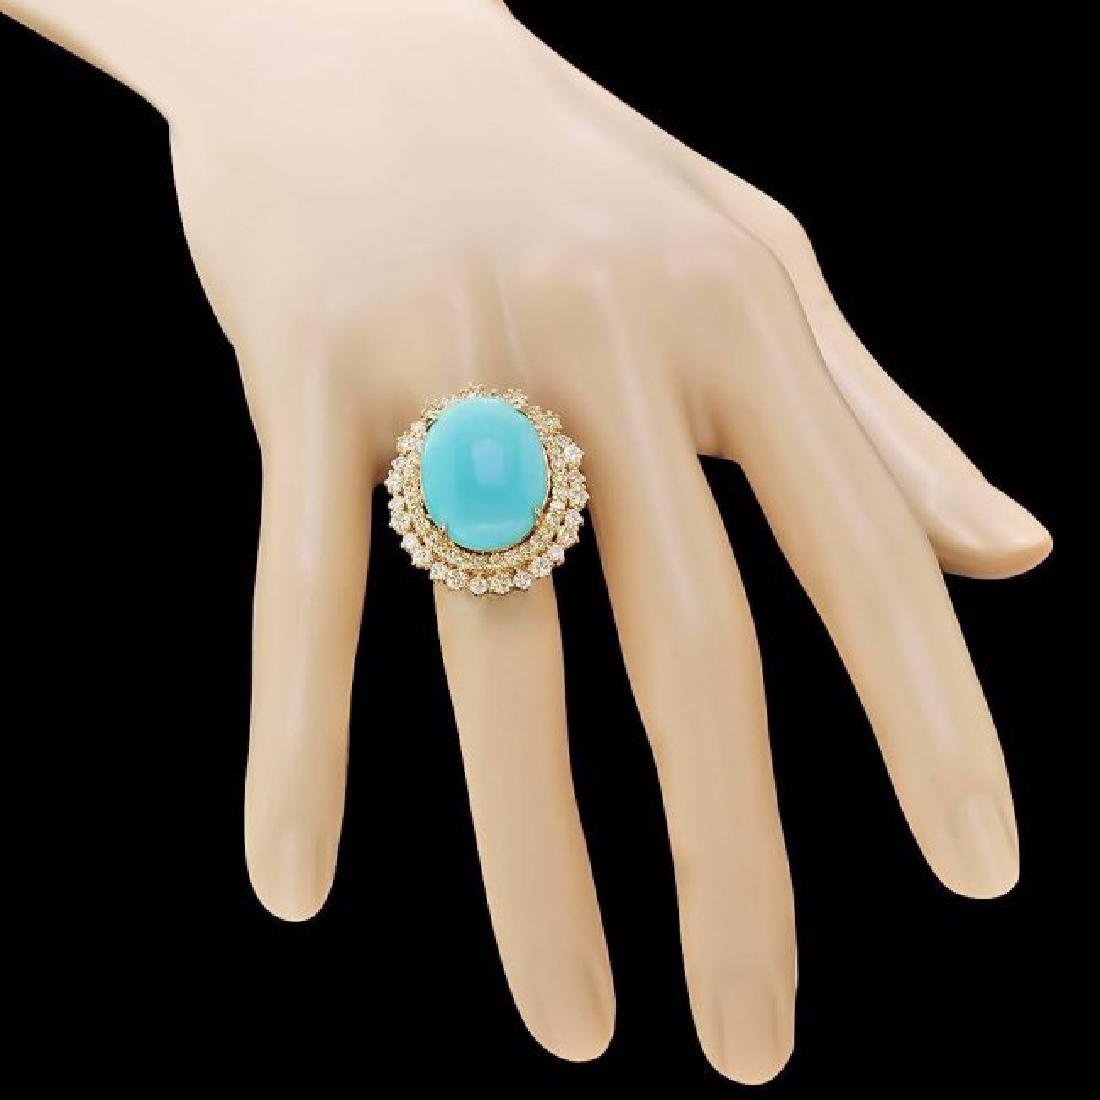 14k Gold 12.00ct Turquoise 2.05ct Diamond Ring - 4